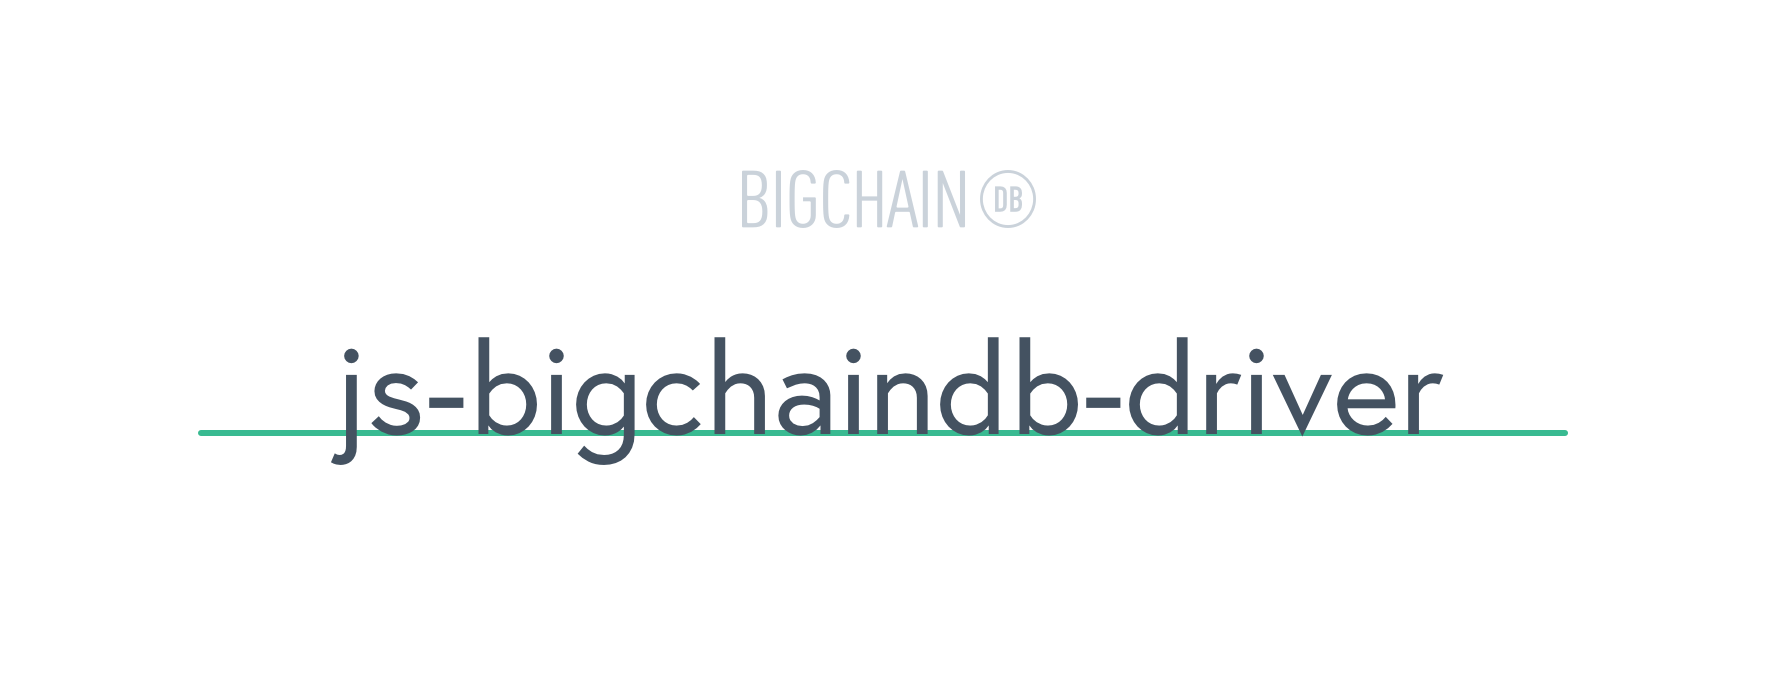 js-bigchaindb-driver